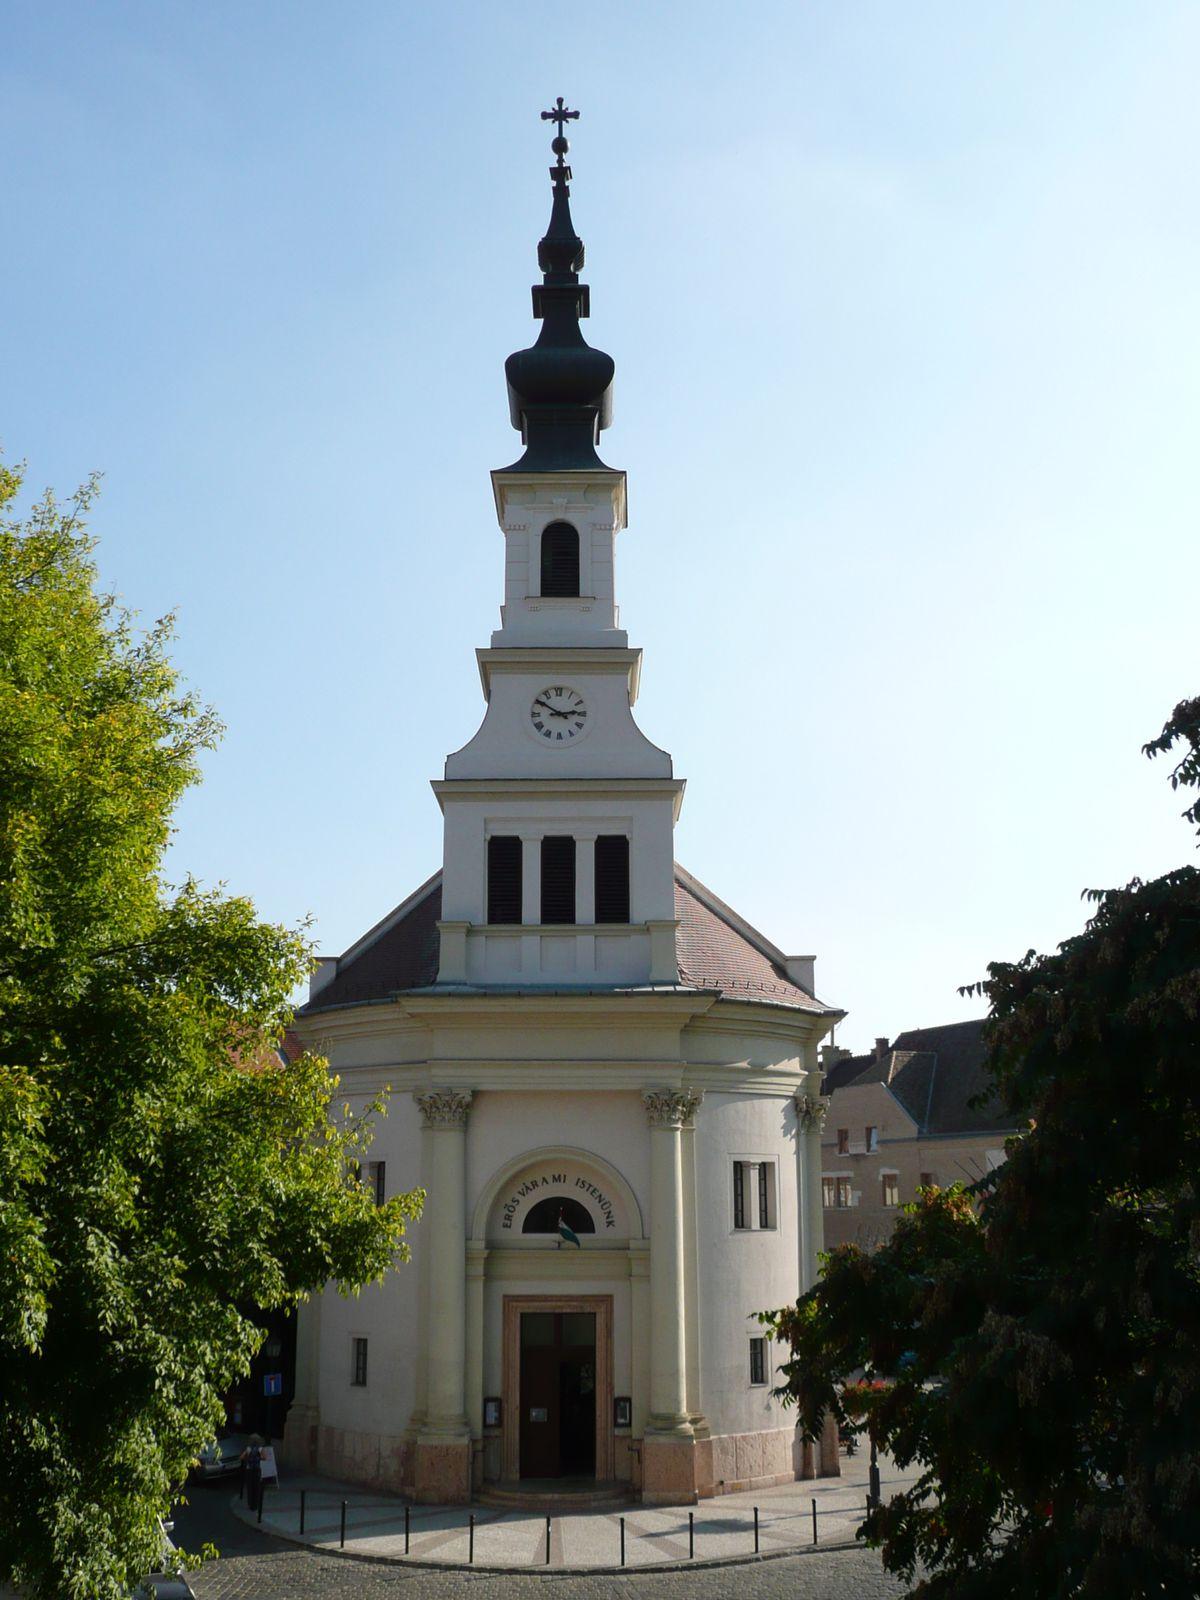 Eglise-luth-rienne---quartier-du-Ch-teau